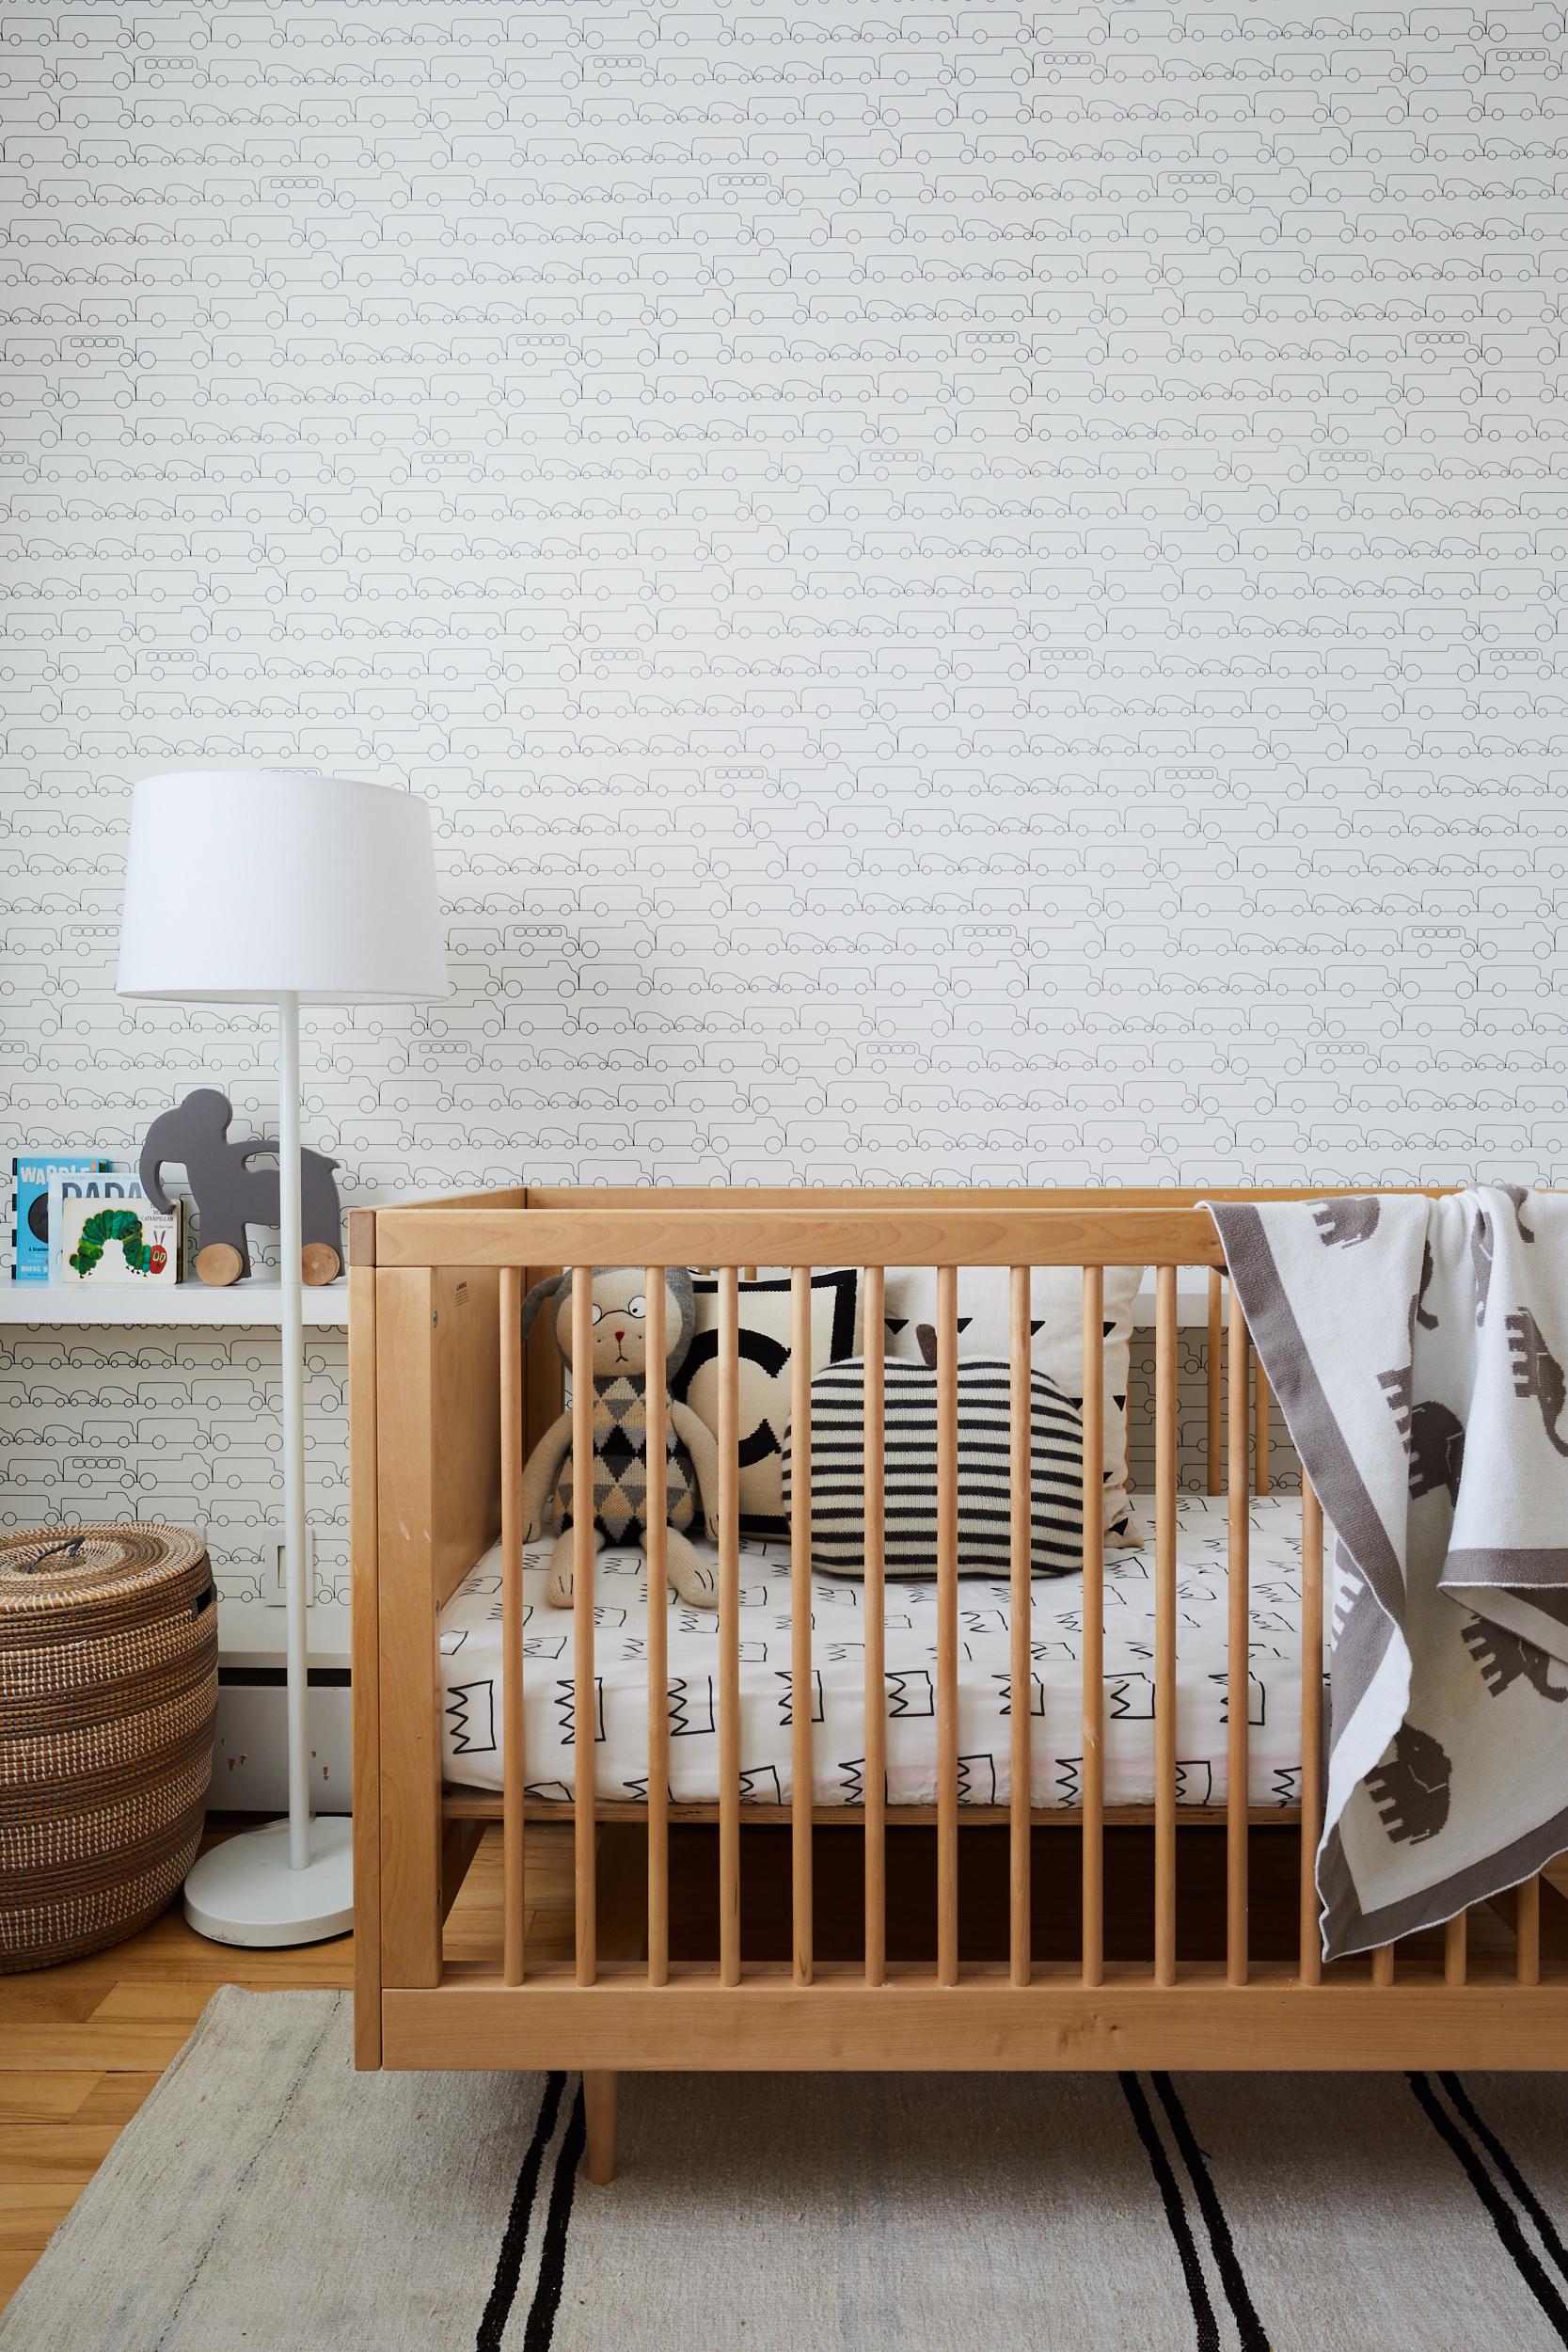 West_19th_Childrens_Room_012.jpg